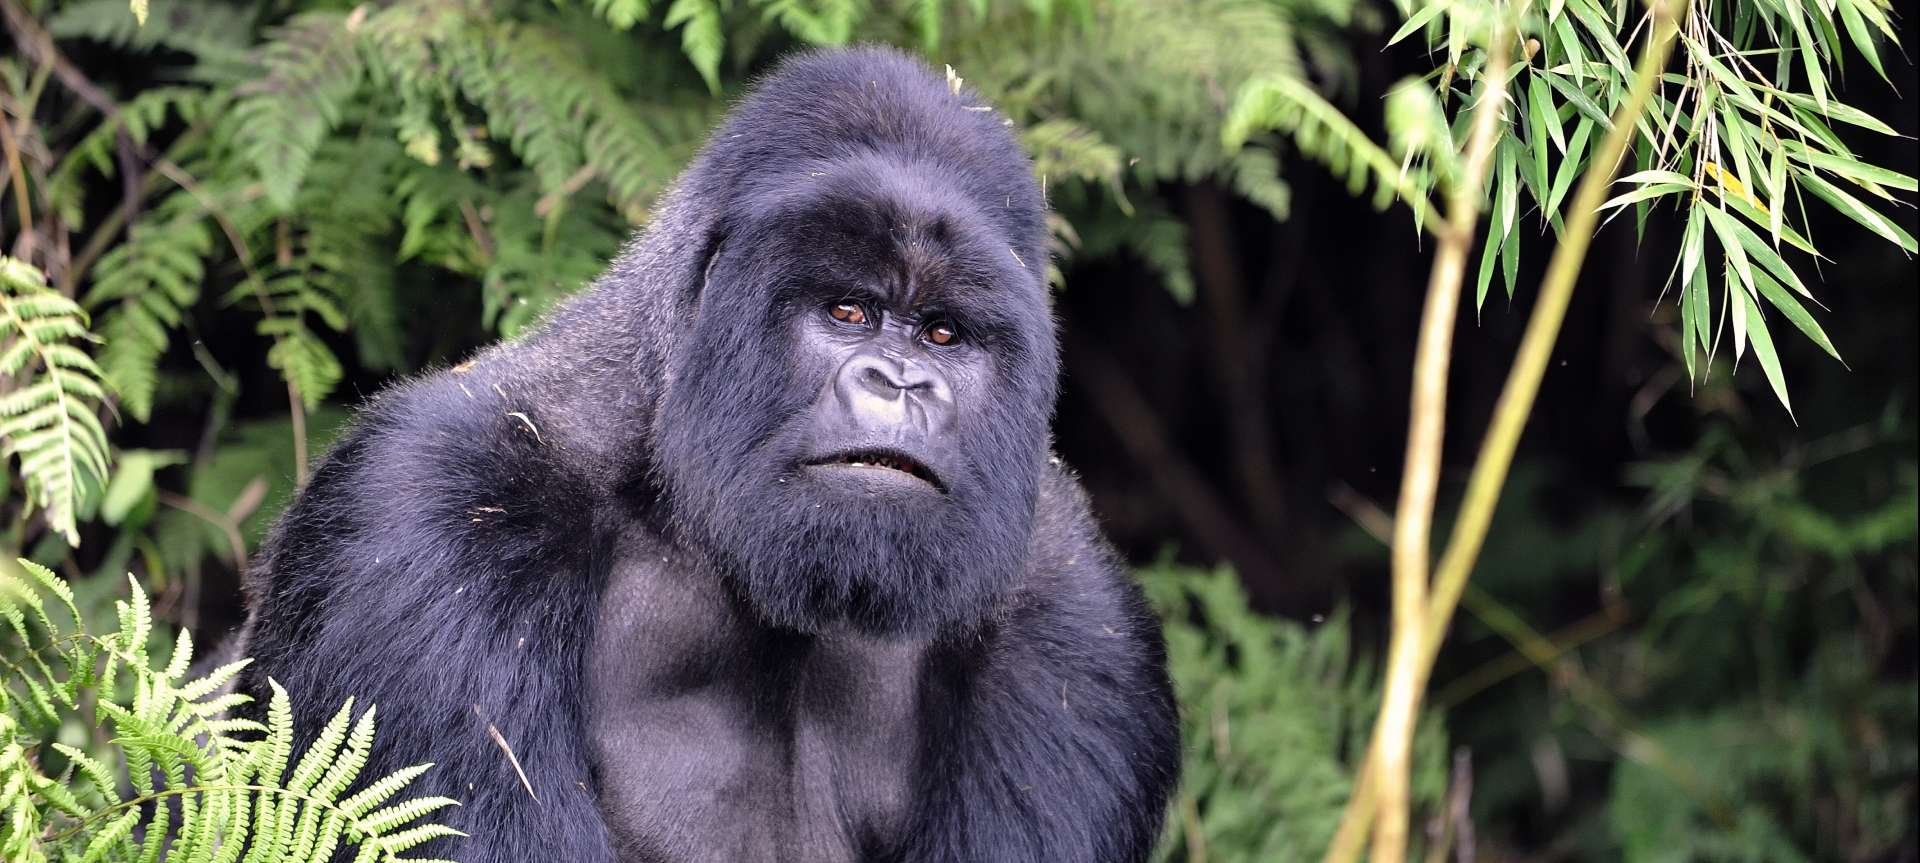 Mountain gorilla trekking in Africa - Africa Wildlife Safaris